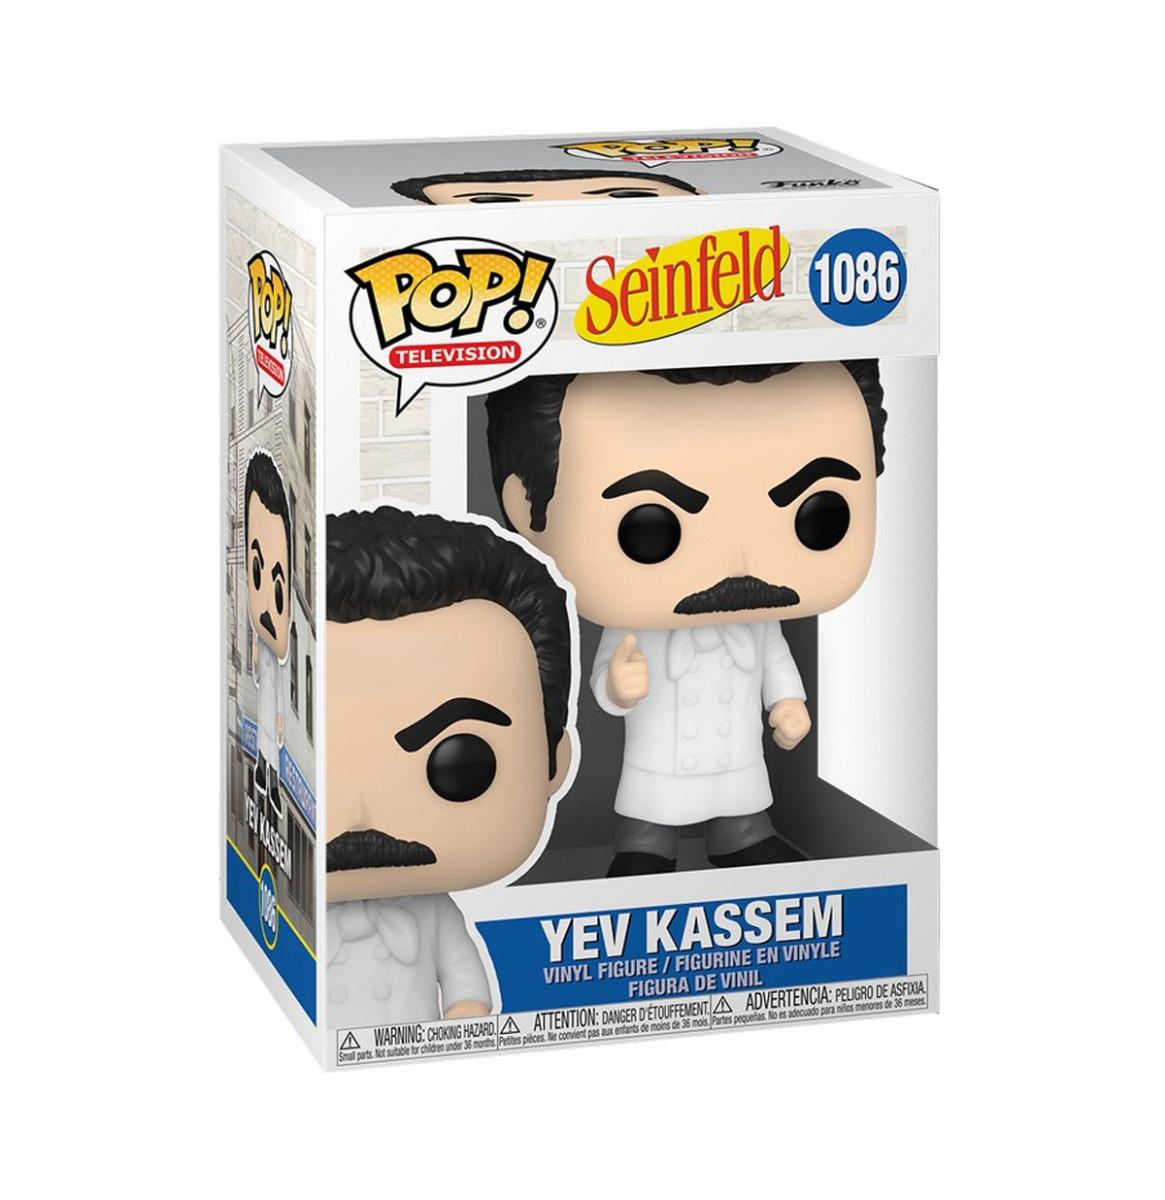 Funko Pop! TV: Seinfeld - Yev Kassem